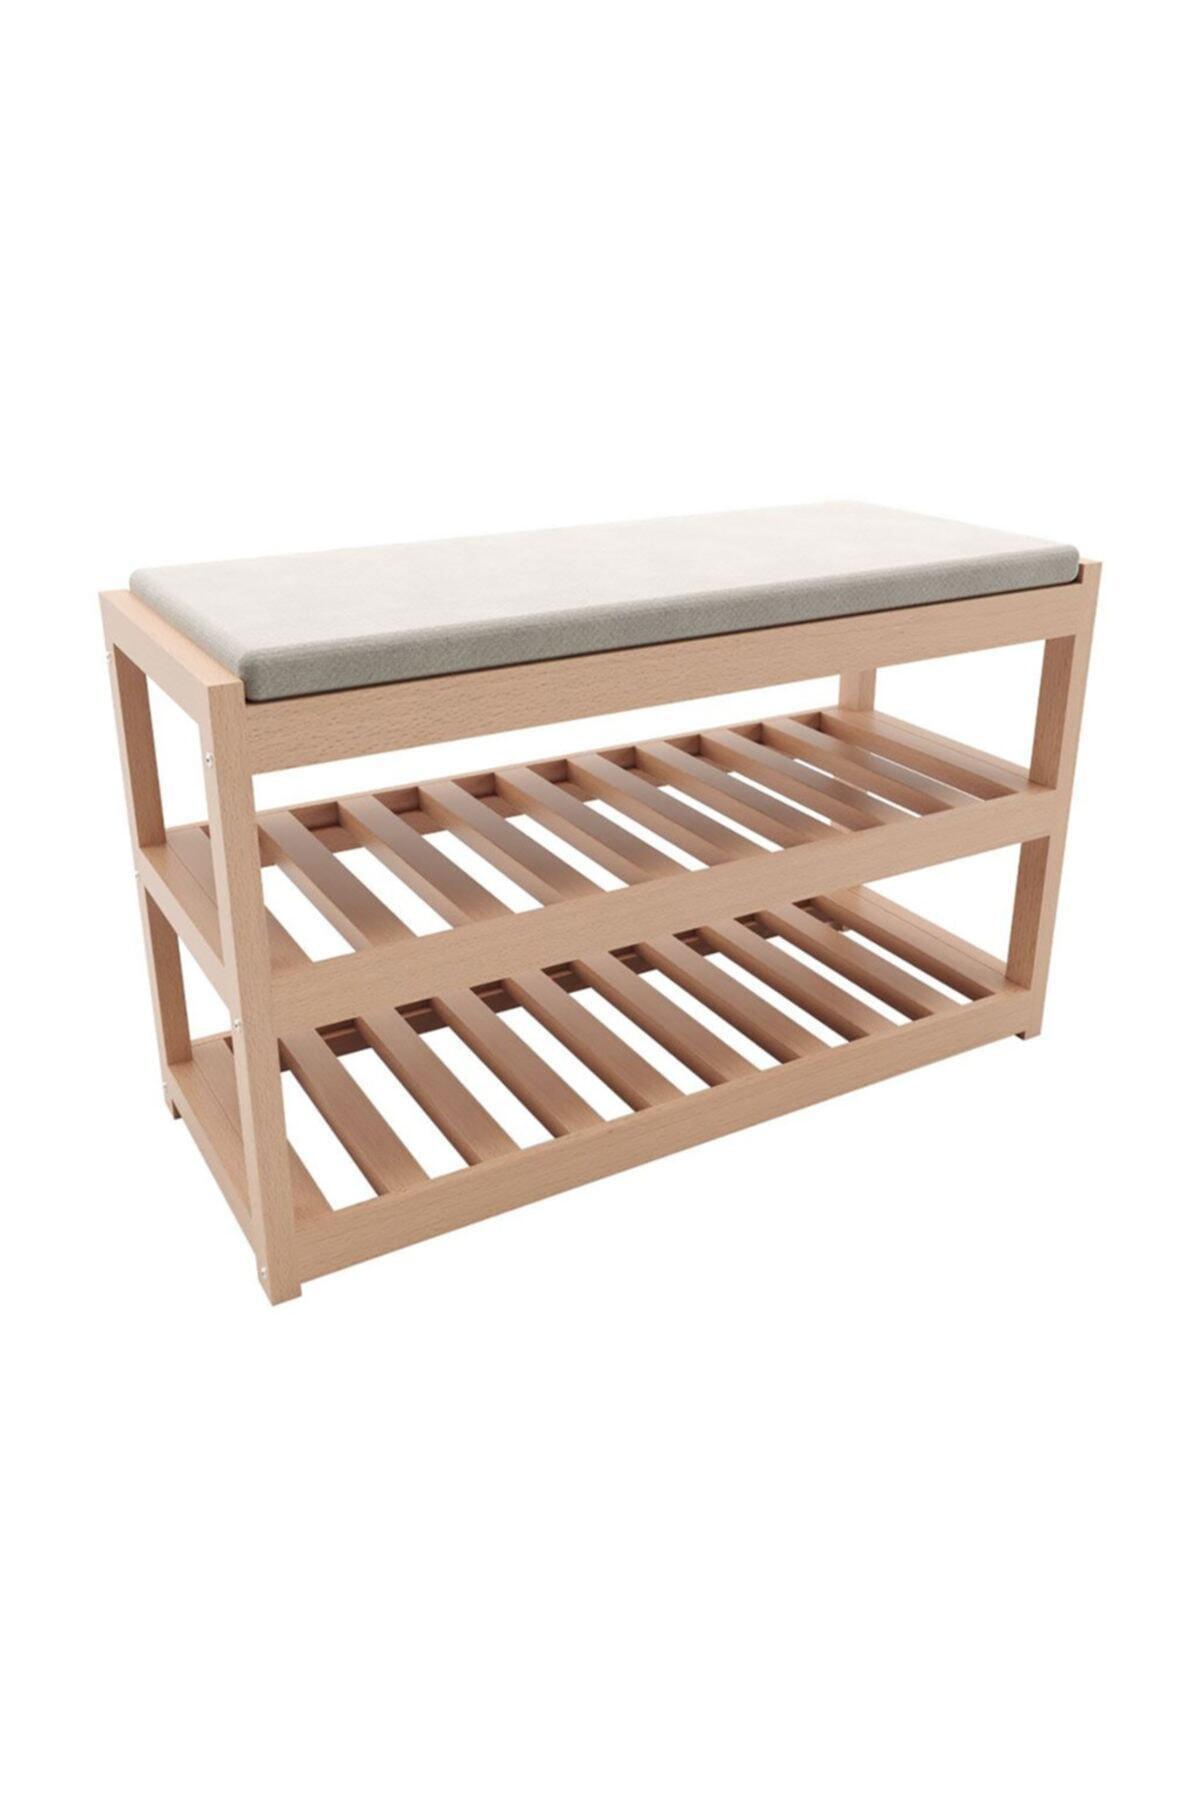 upper Double Shelf Wood Shoe Upper Sedate Solid Wood Minderli Shoe Upper